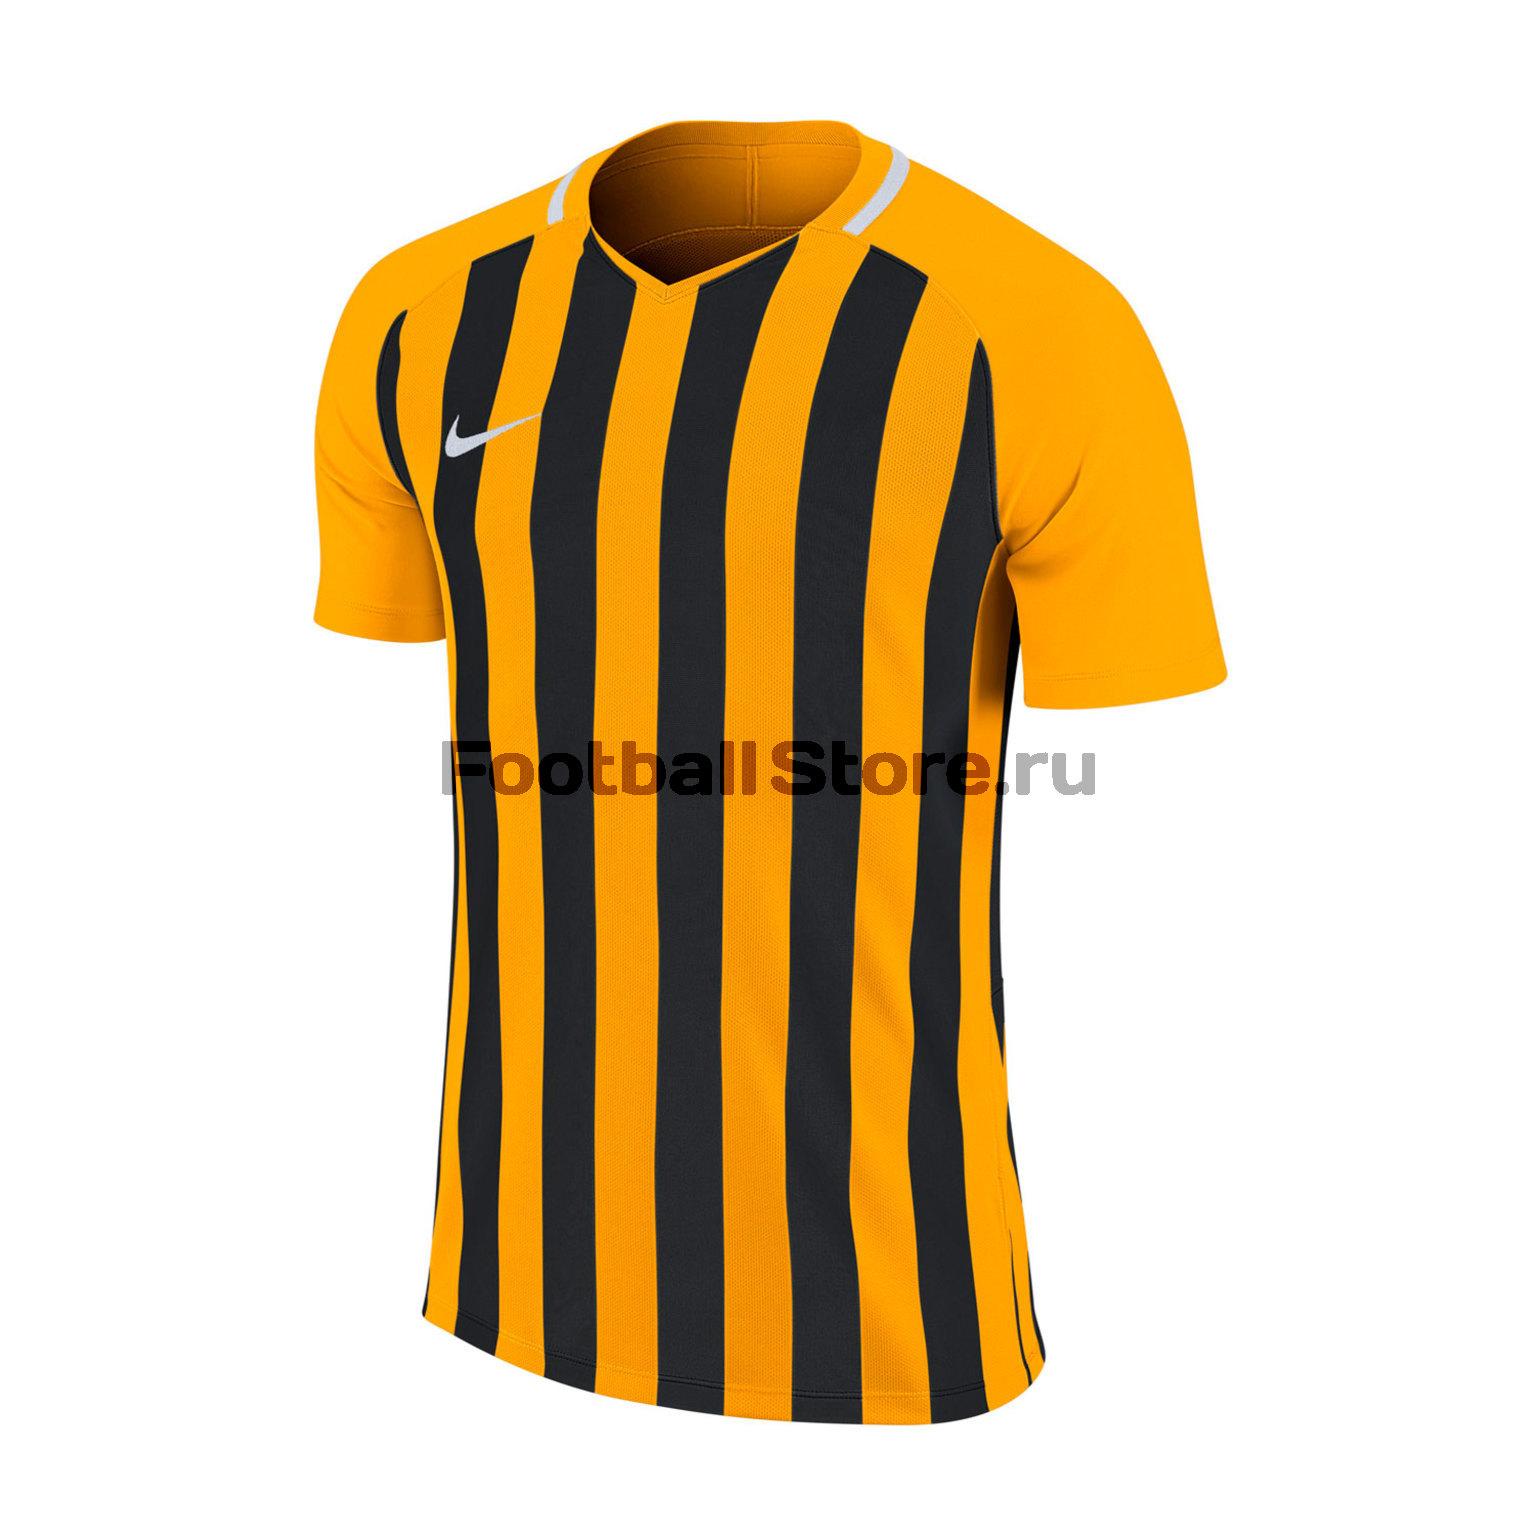 Футболка подростковая Nike SS Striped Division JSY 894102-739 nike футболка zenit ss h a stadium jsy